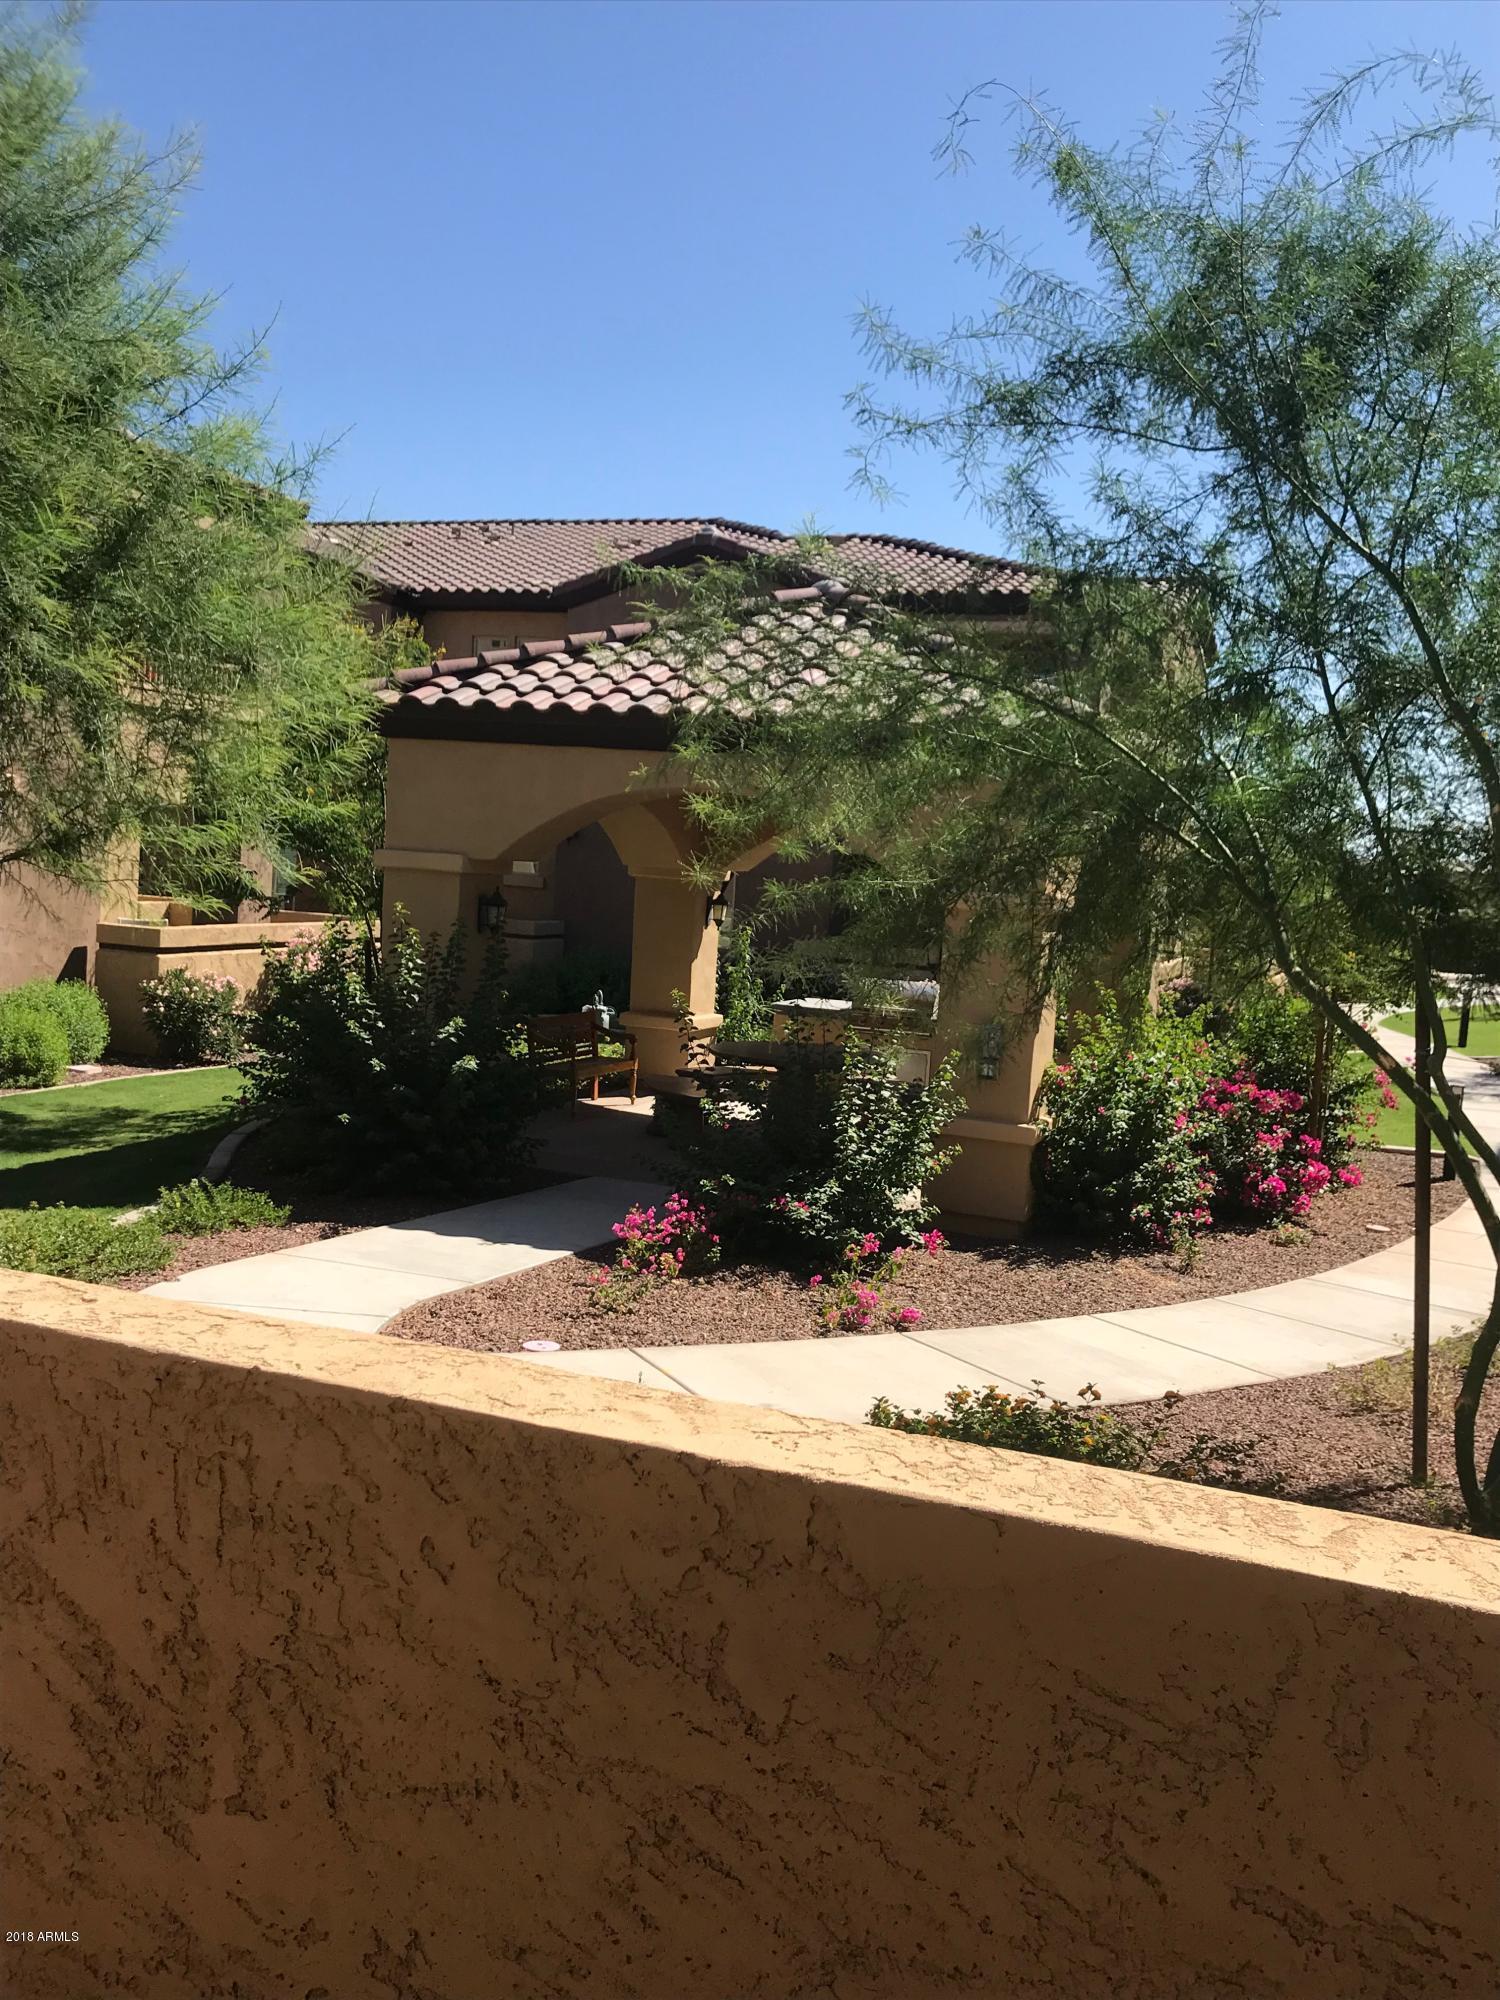 MLS 5821367 250 W QUEEN CREEK Road Unit 110 Building 3, Chandler, AZ 85248 Chandler AZ Carino Estates